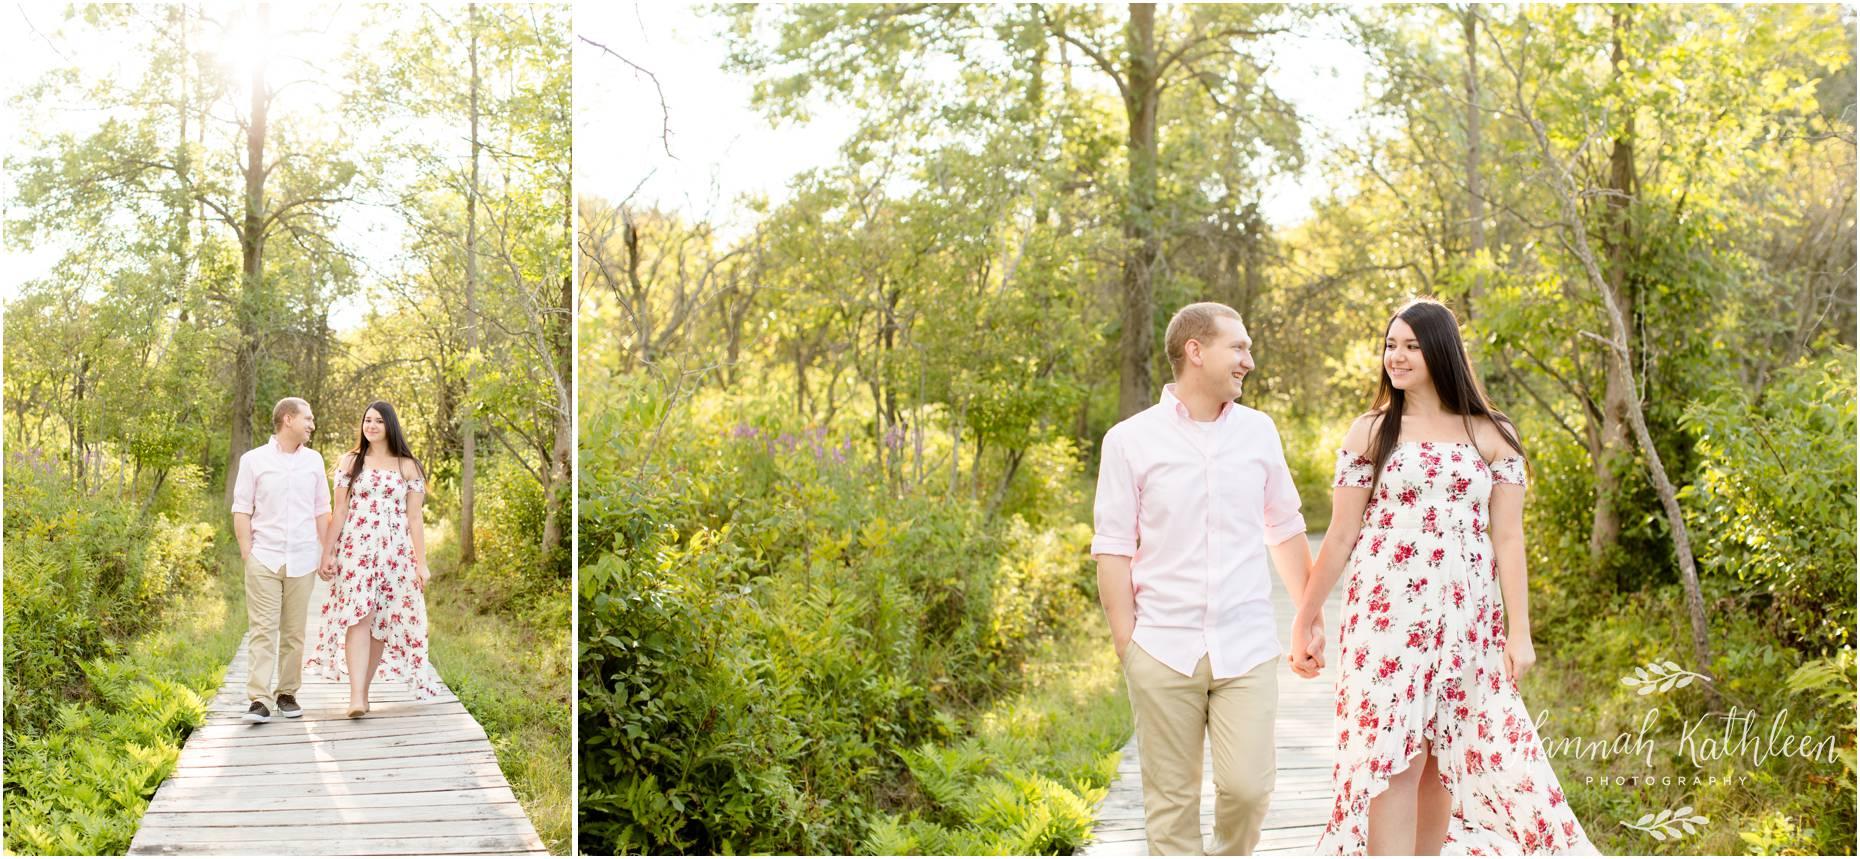 Cheektowaga_New_York_Proposal_Photography